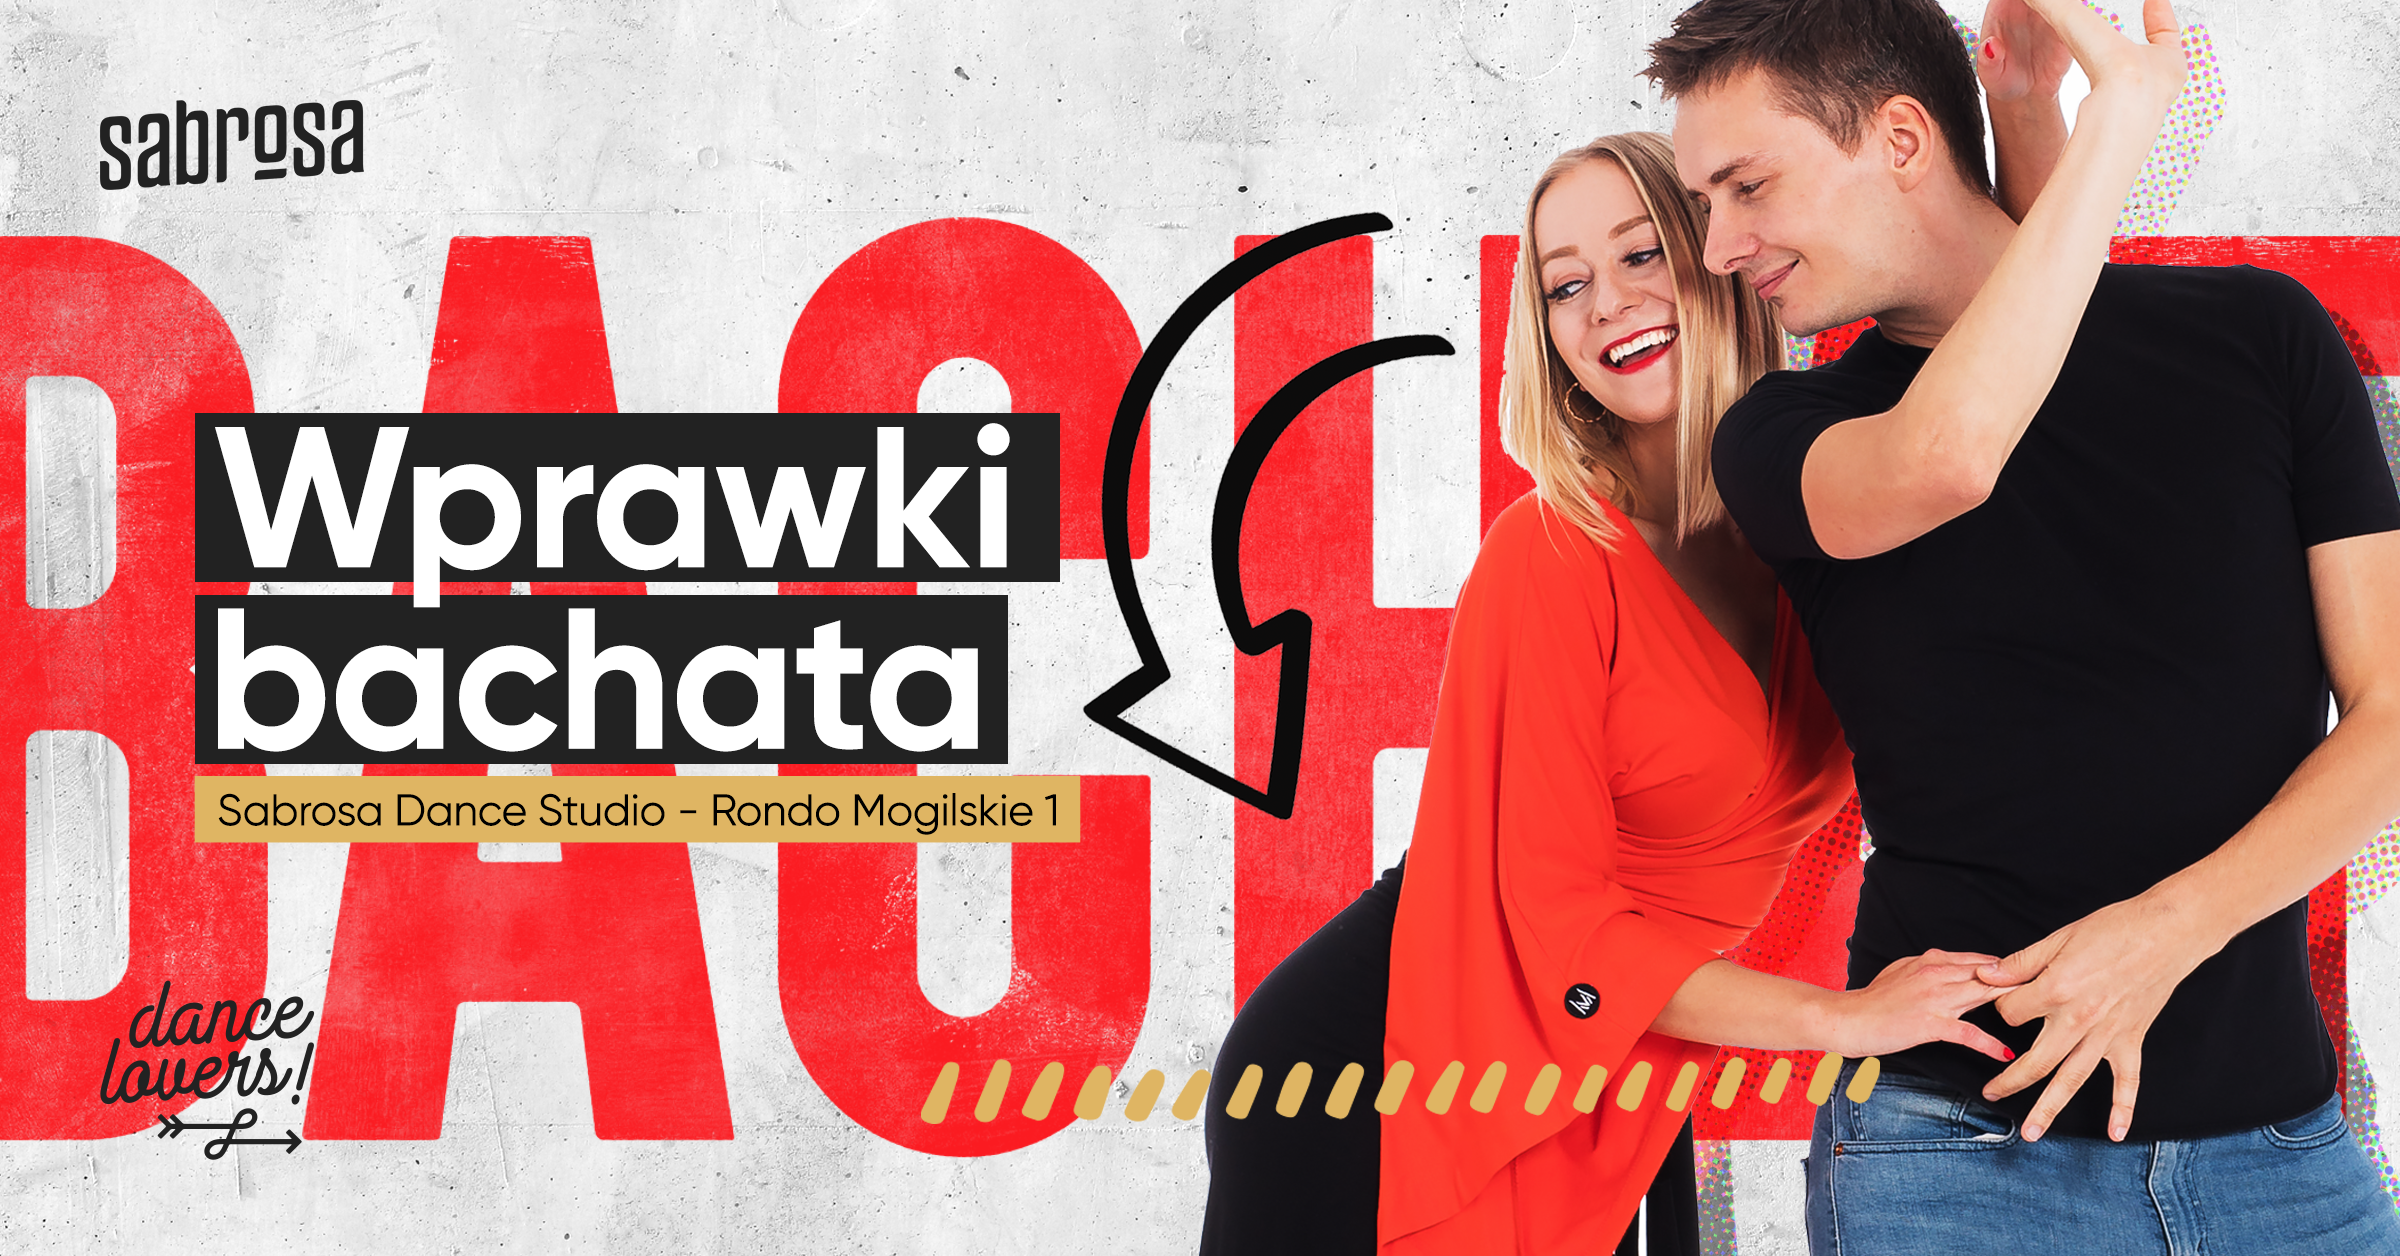 Wprawki Bachatowe  w Salsa Sabrosa Dance Studio - Kraków